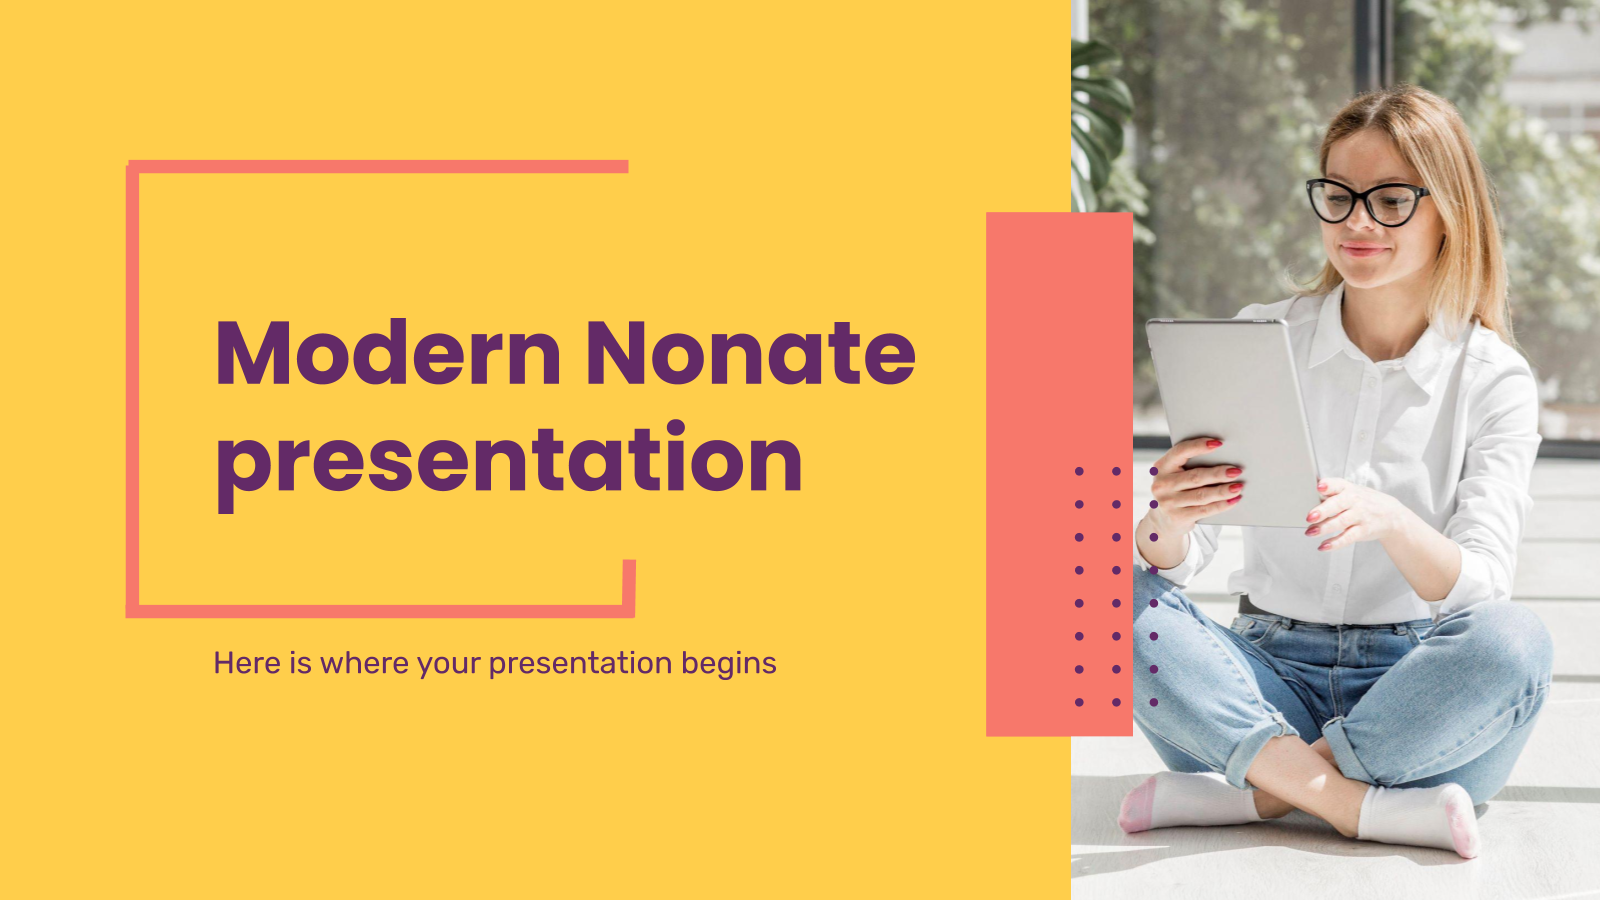 Modern Nonate presentation presentation template